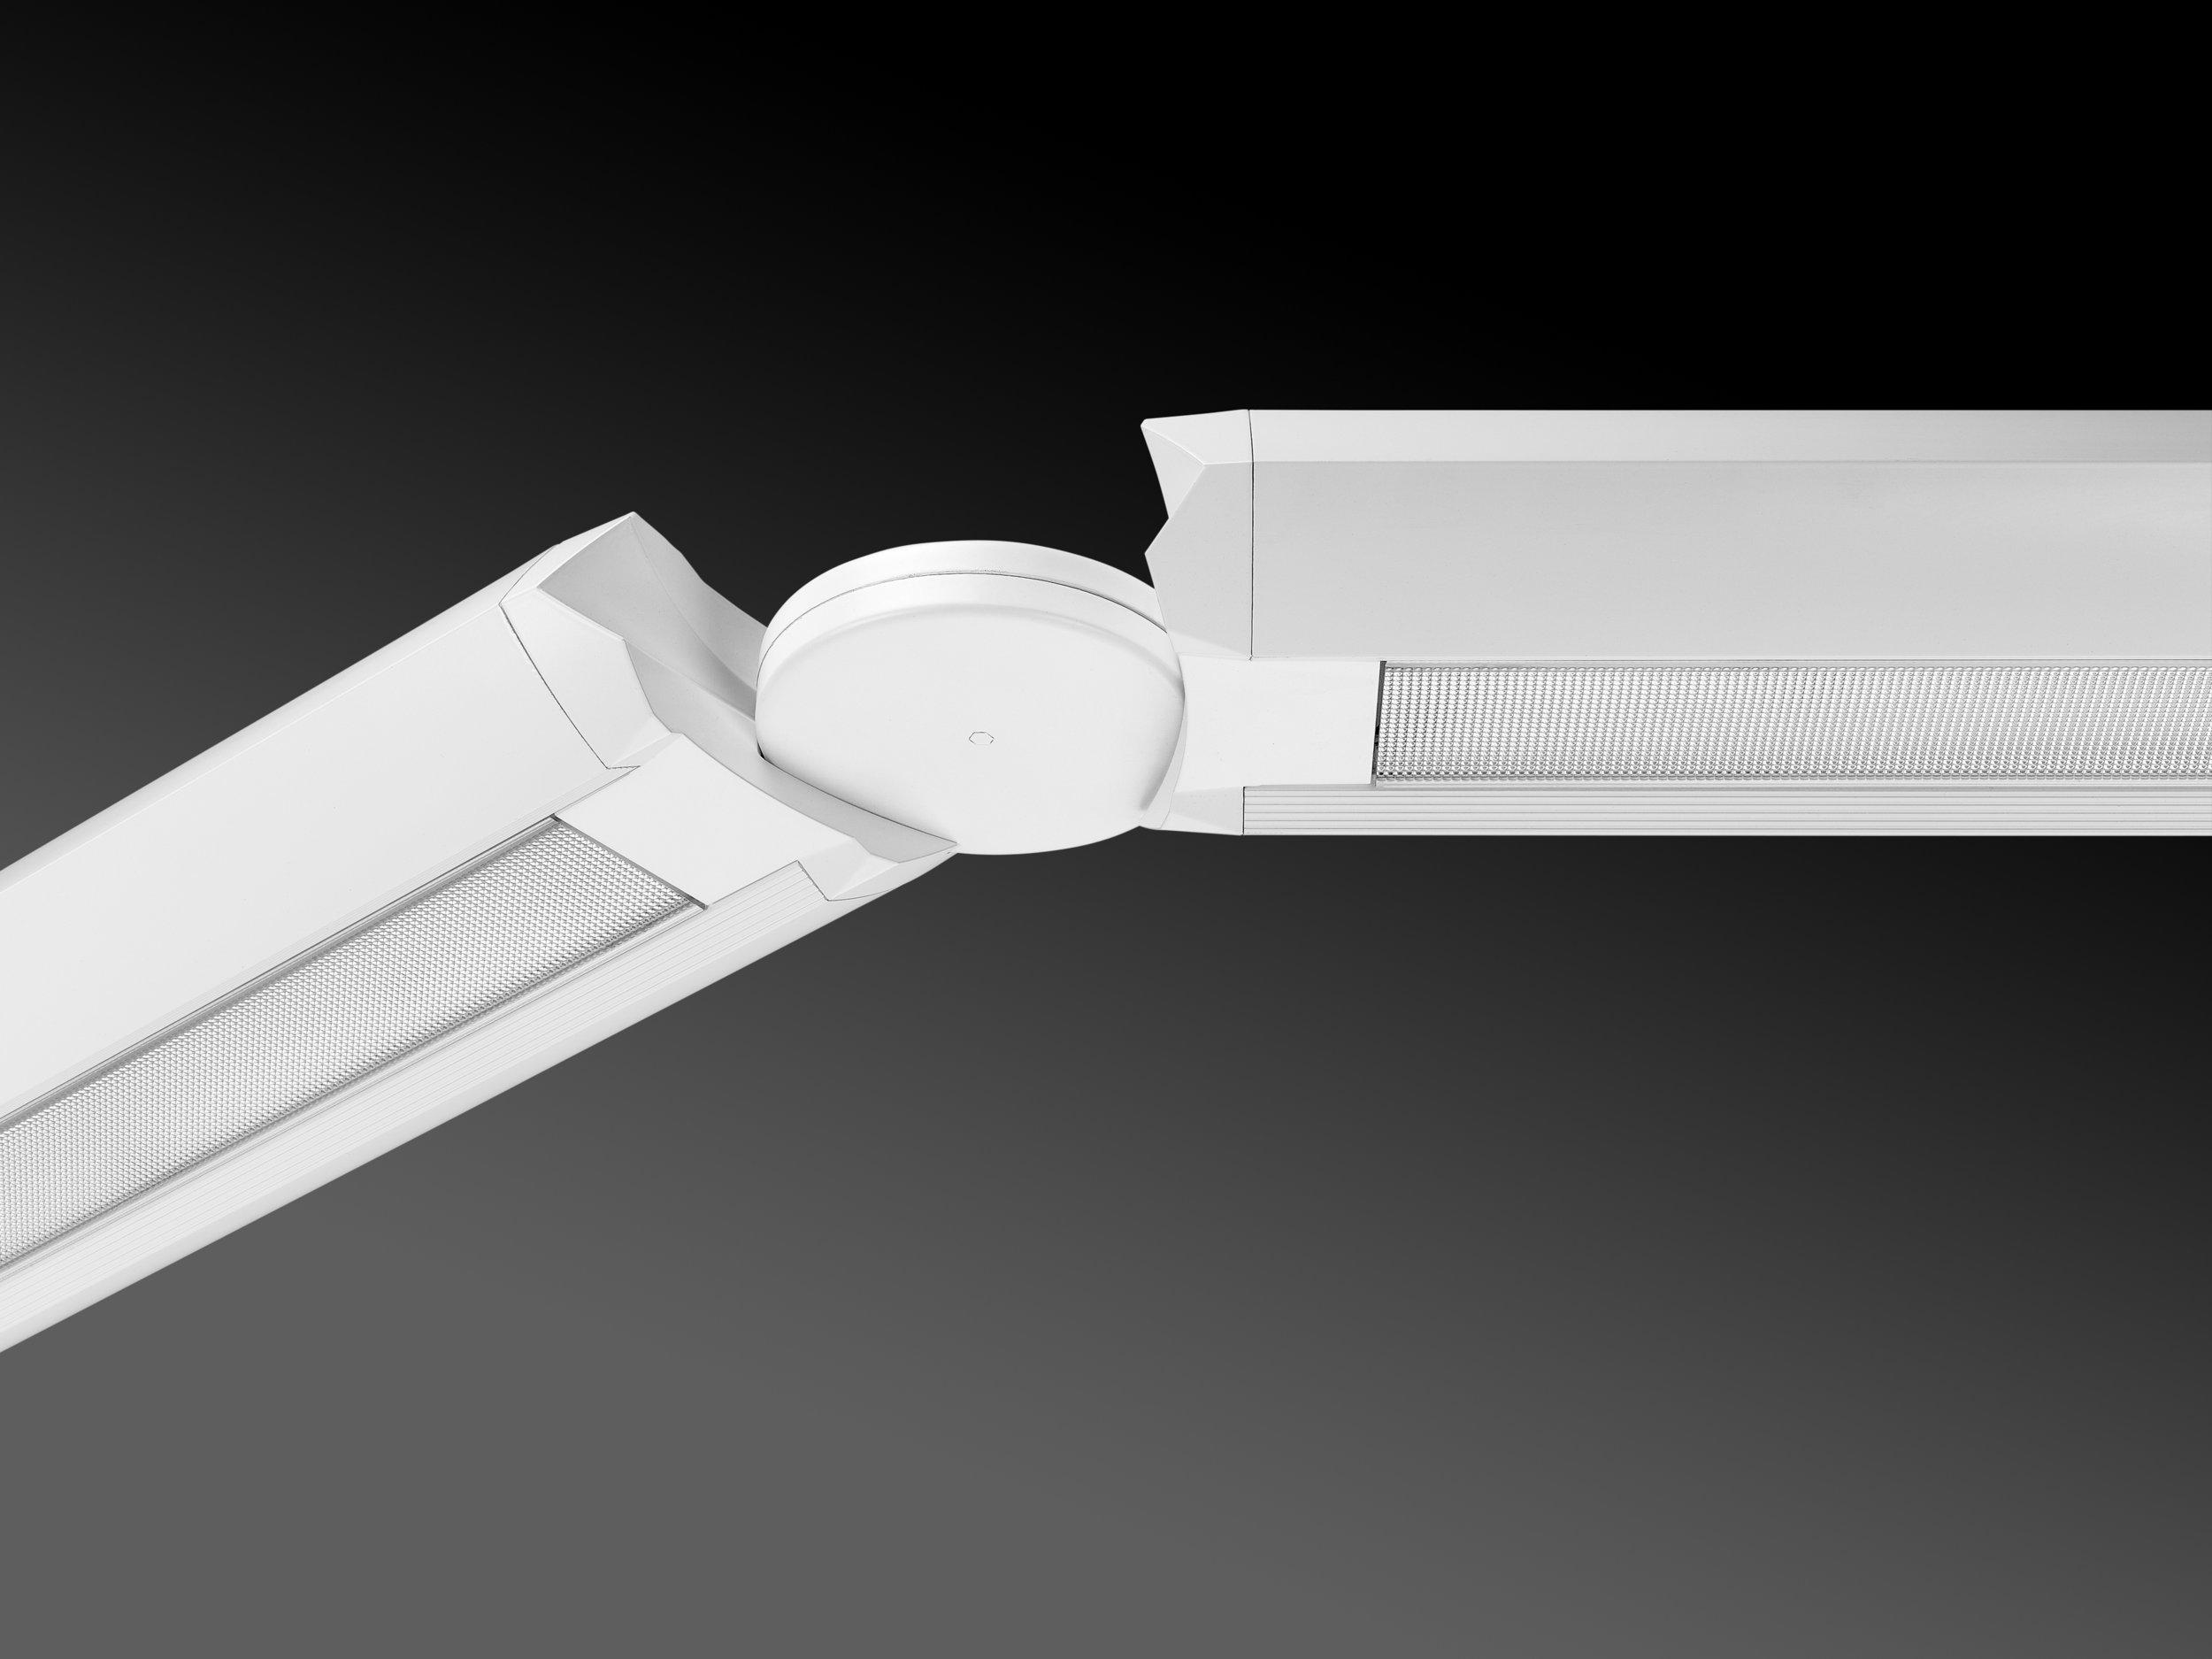 Horizontal corner joint